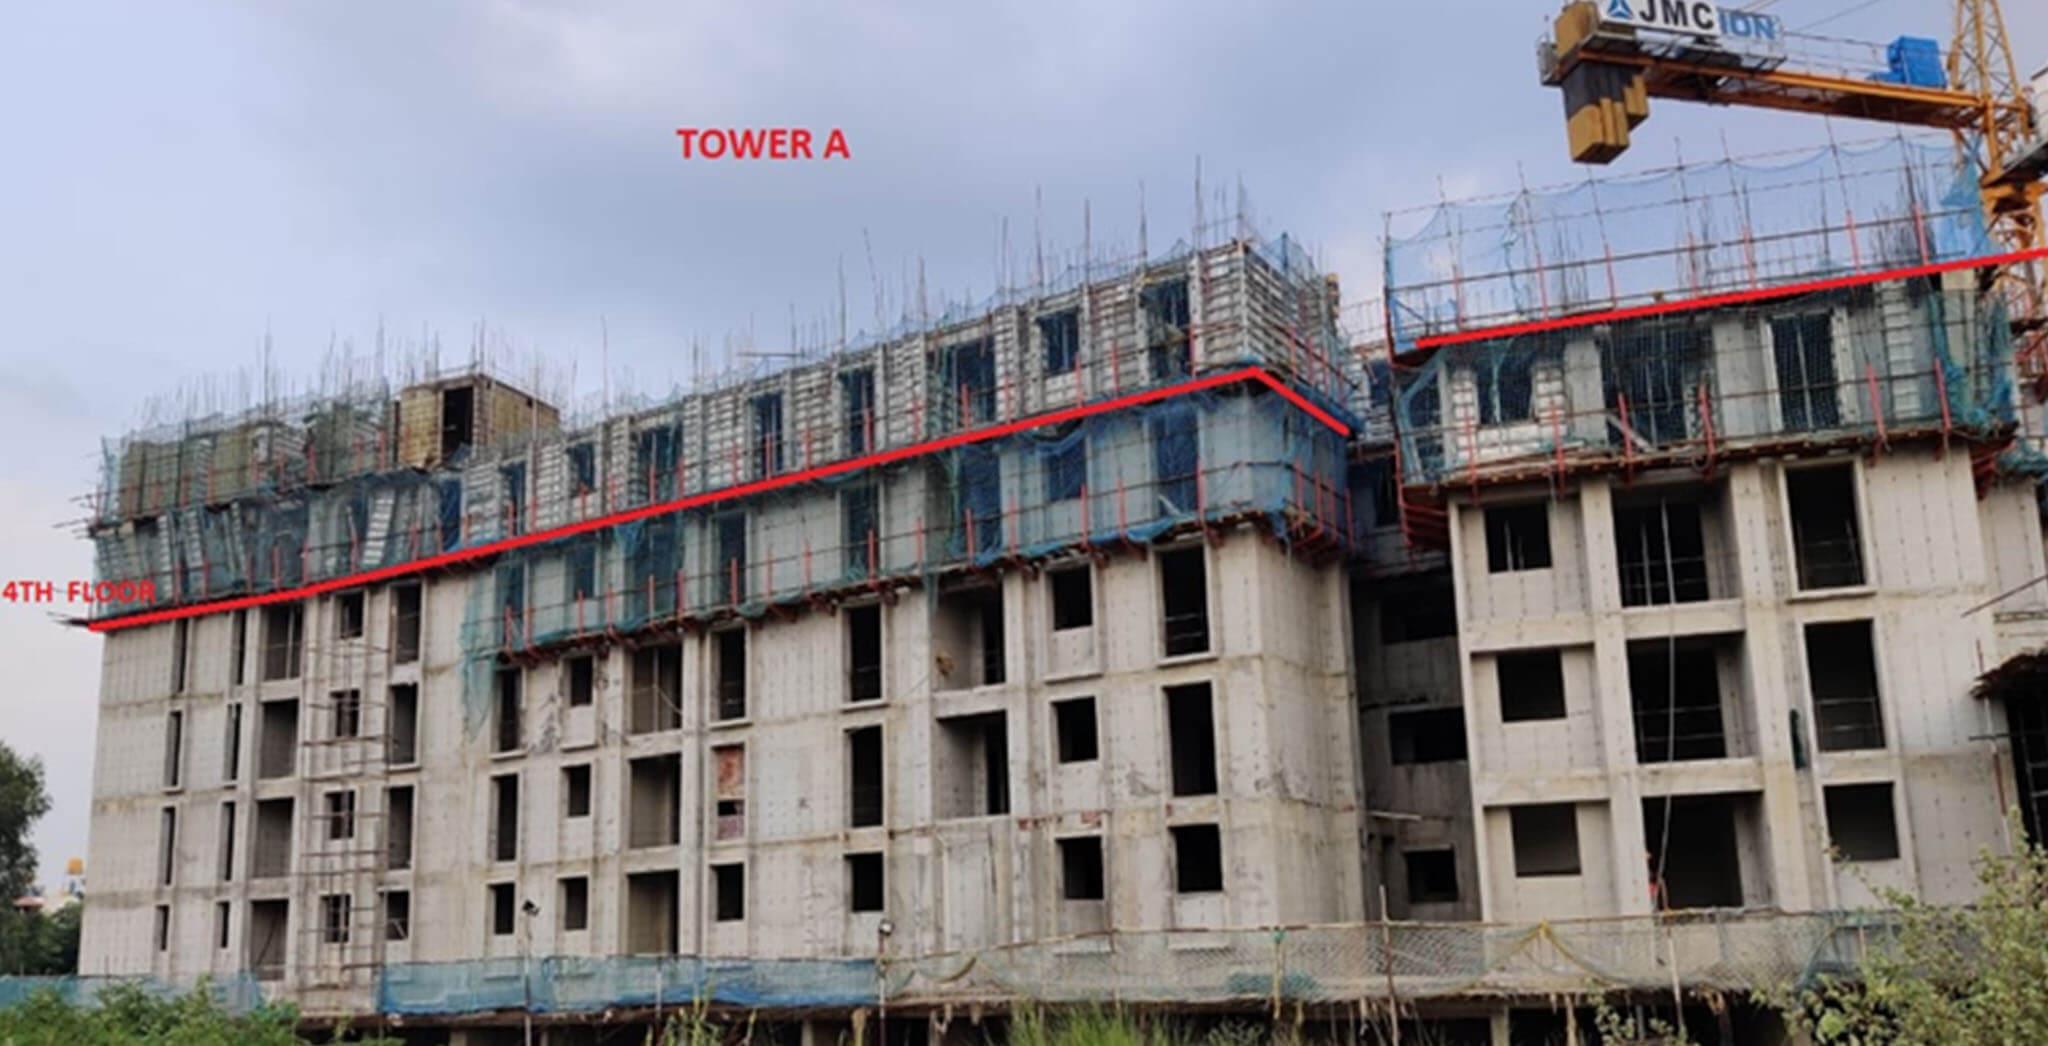 Sep 2020 - Eden: Tower A—Completion of Fourth floor slab Milestone